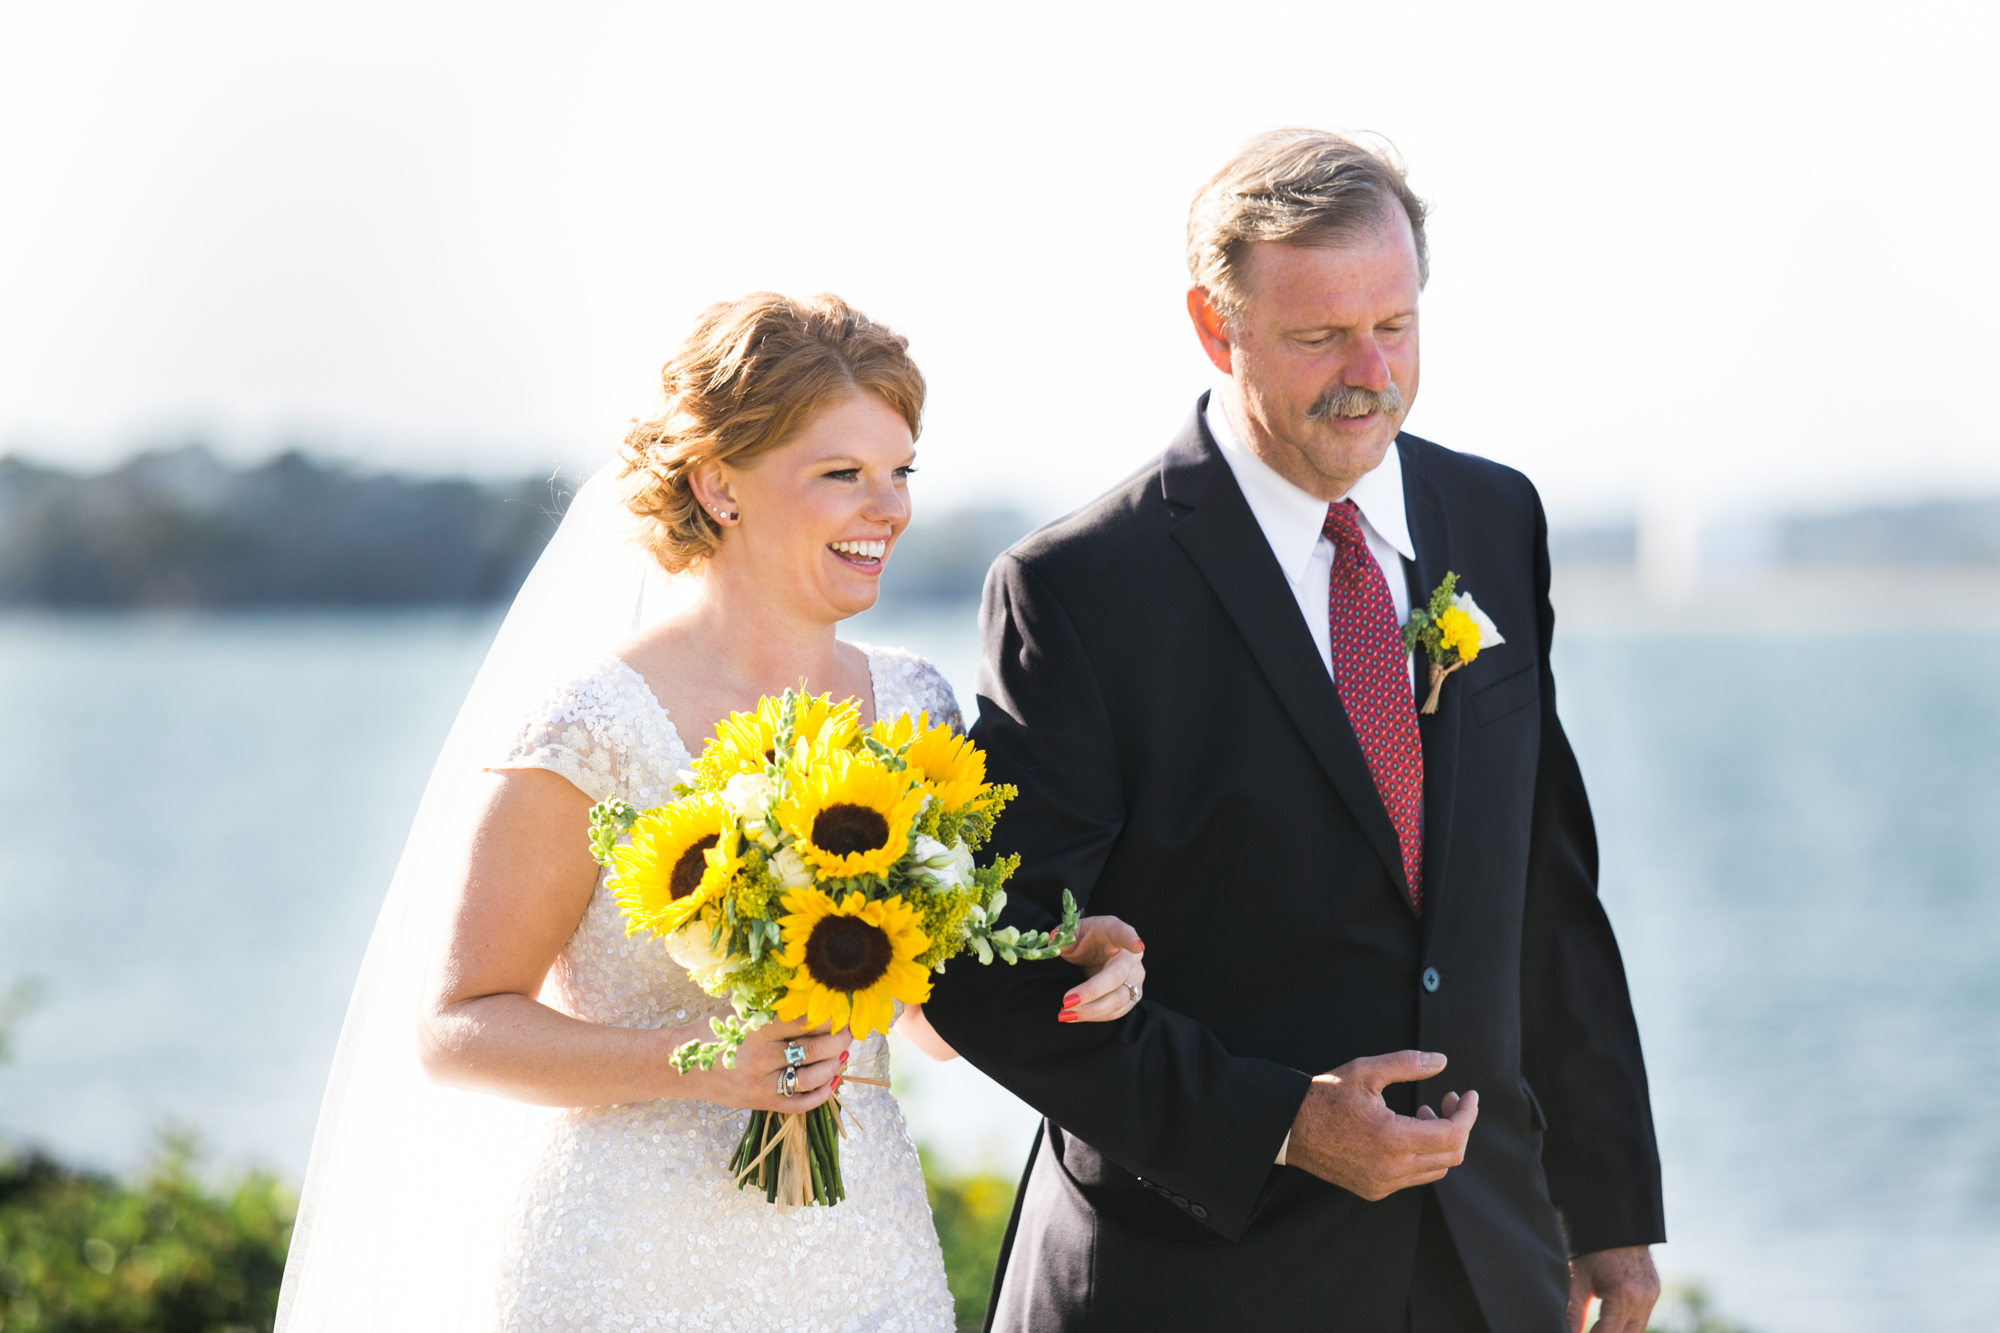 Nahant-Massachusetts-New-England-Tent-Beach-Wedding-Photography-Photographer-6.jpg